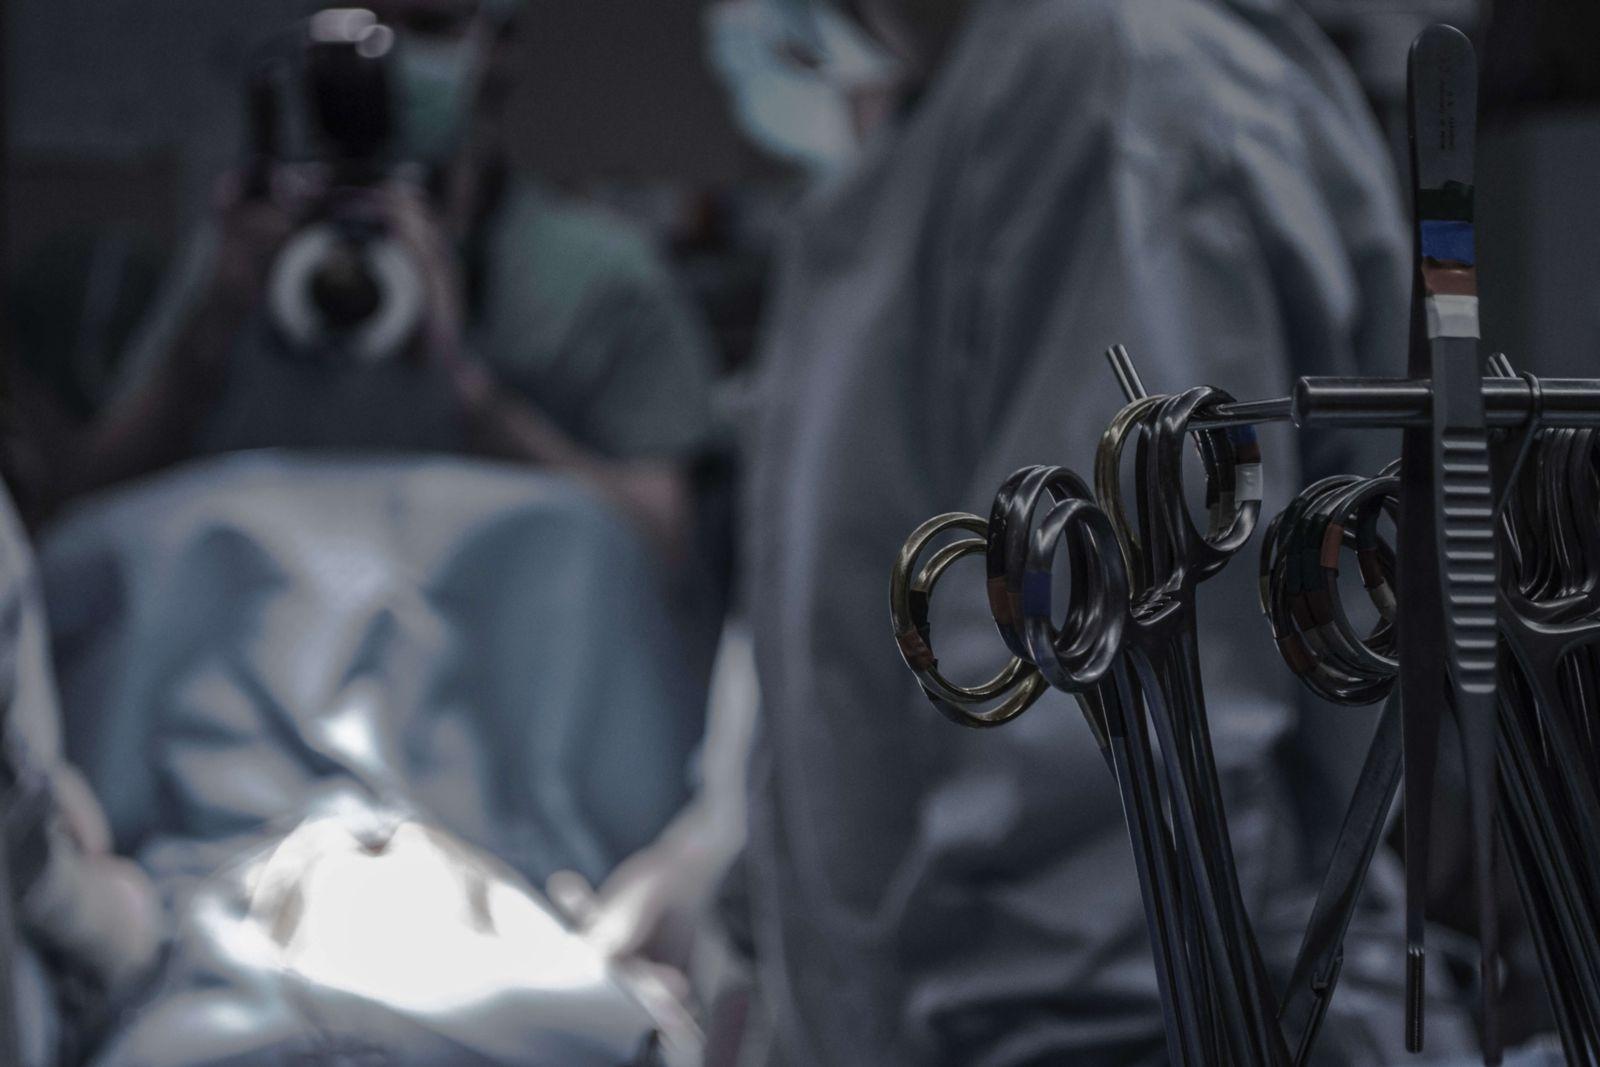 arthroscopic surgery